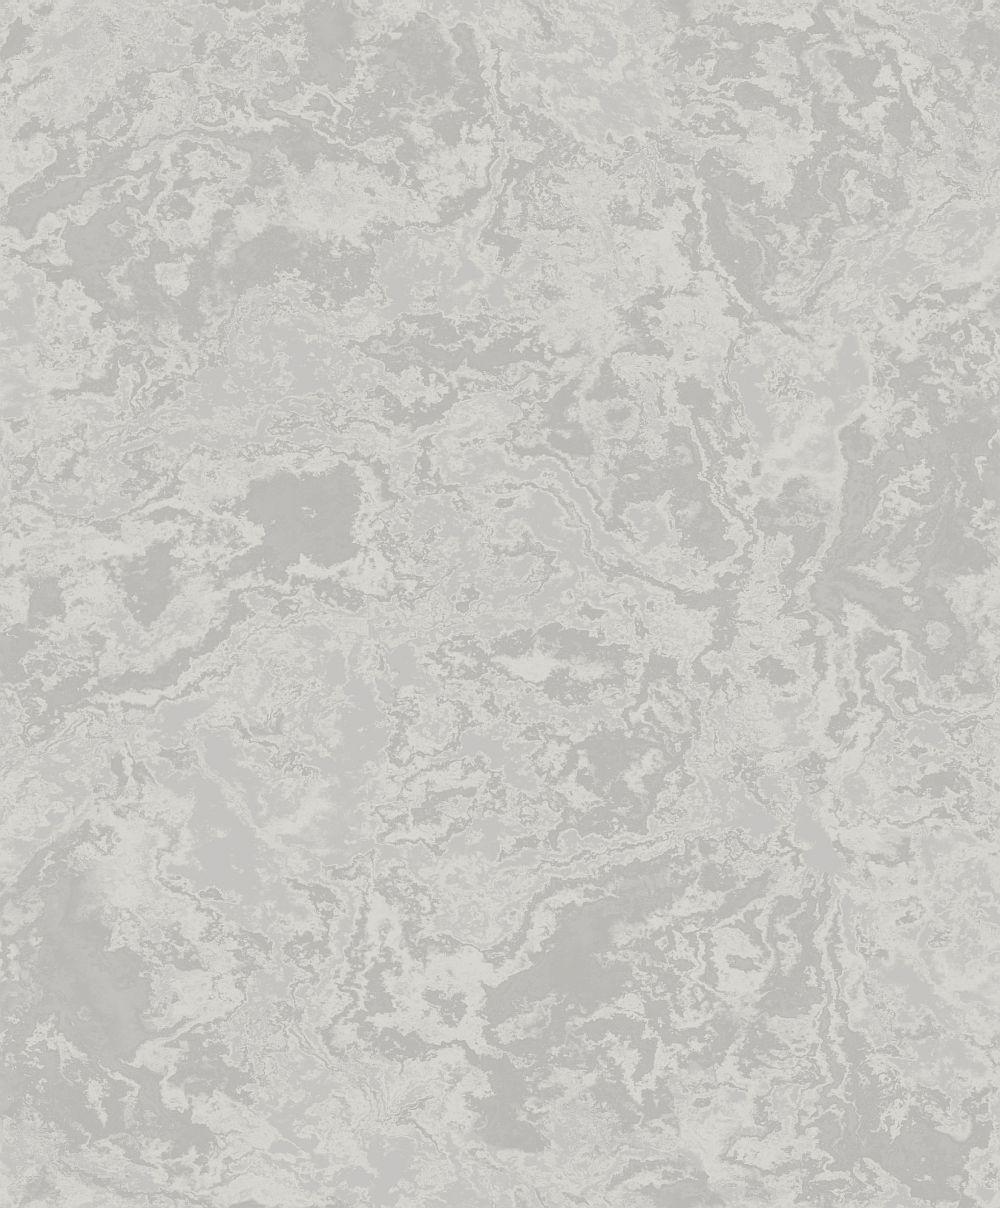 Fantastic Wallpaper Marble Silver - 143666orig  Photograph_93861.jpg